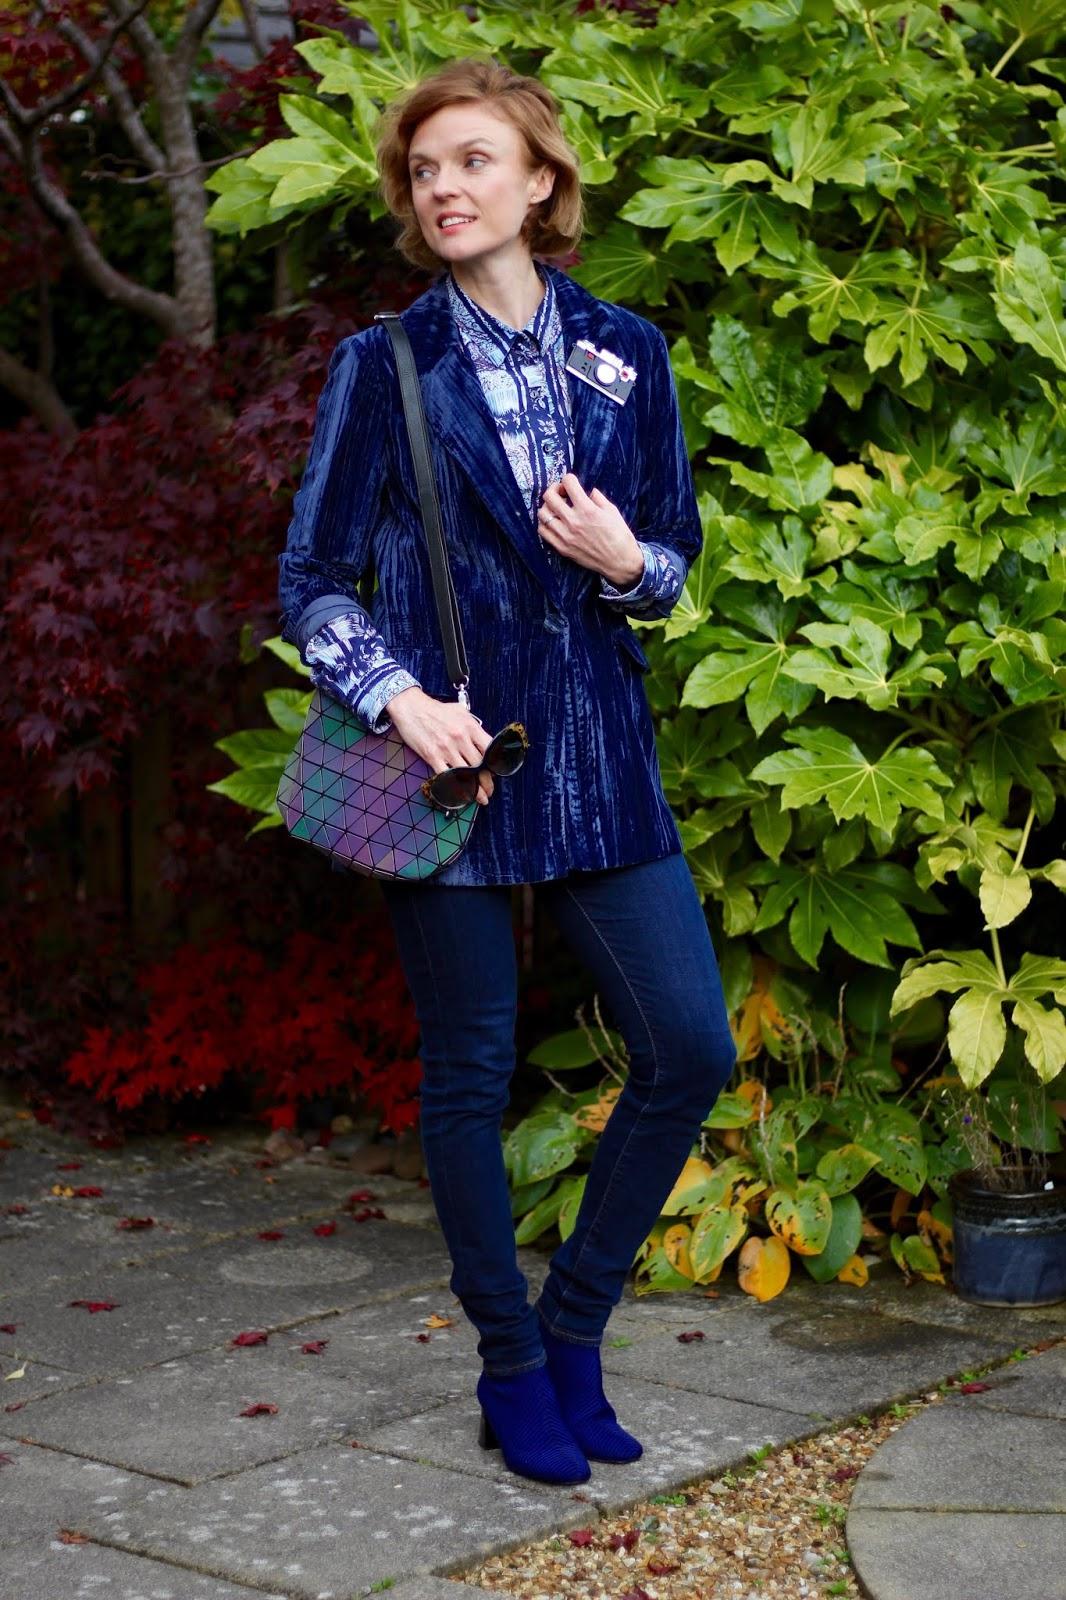 Blue Velvet Blazer as Daywear | Autumn Outfit | Fake Fabulous